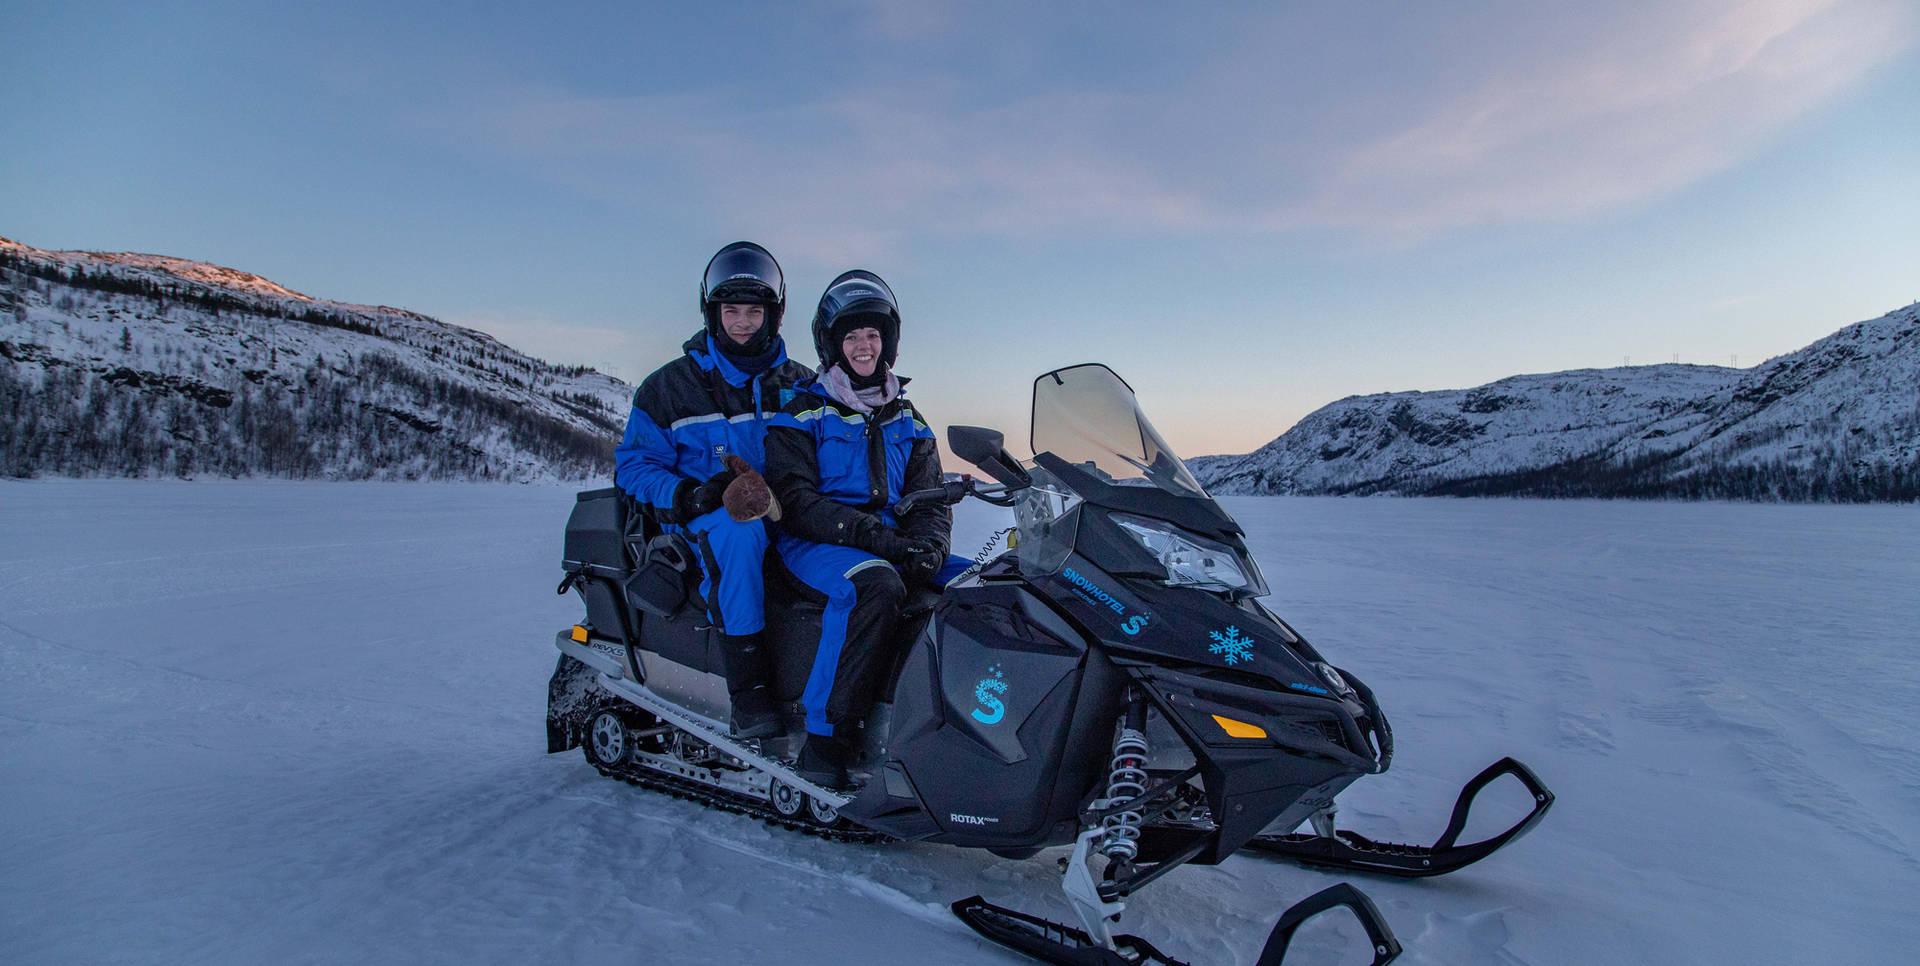 Romantic snowmobile tour